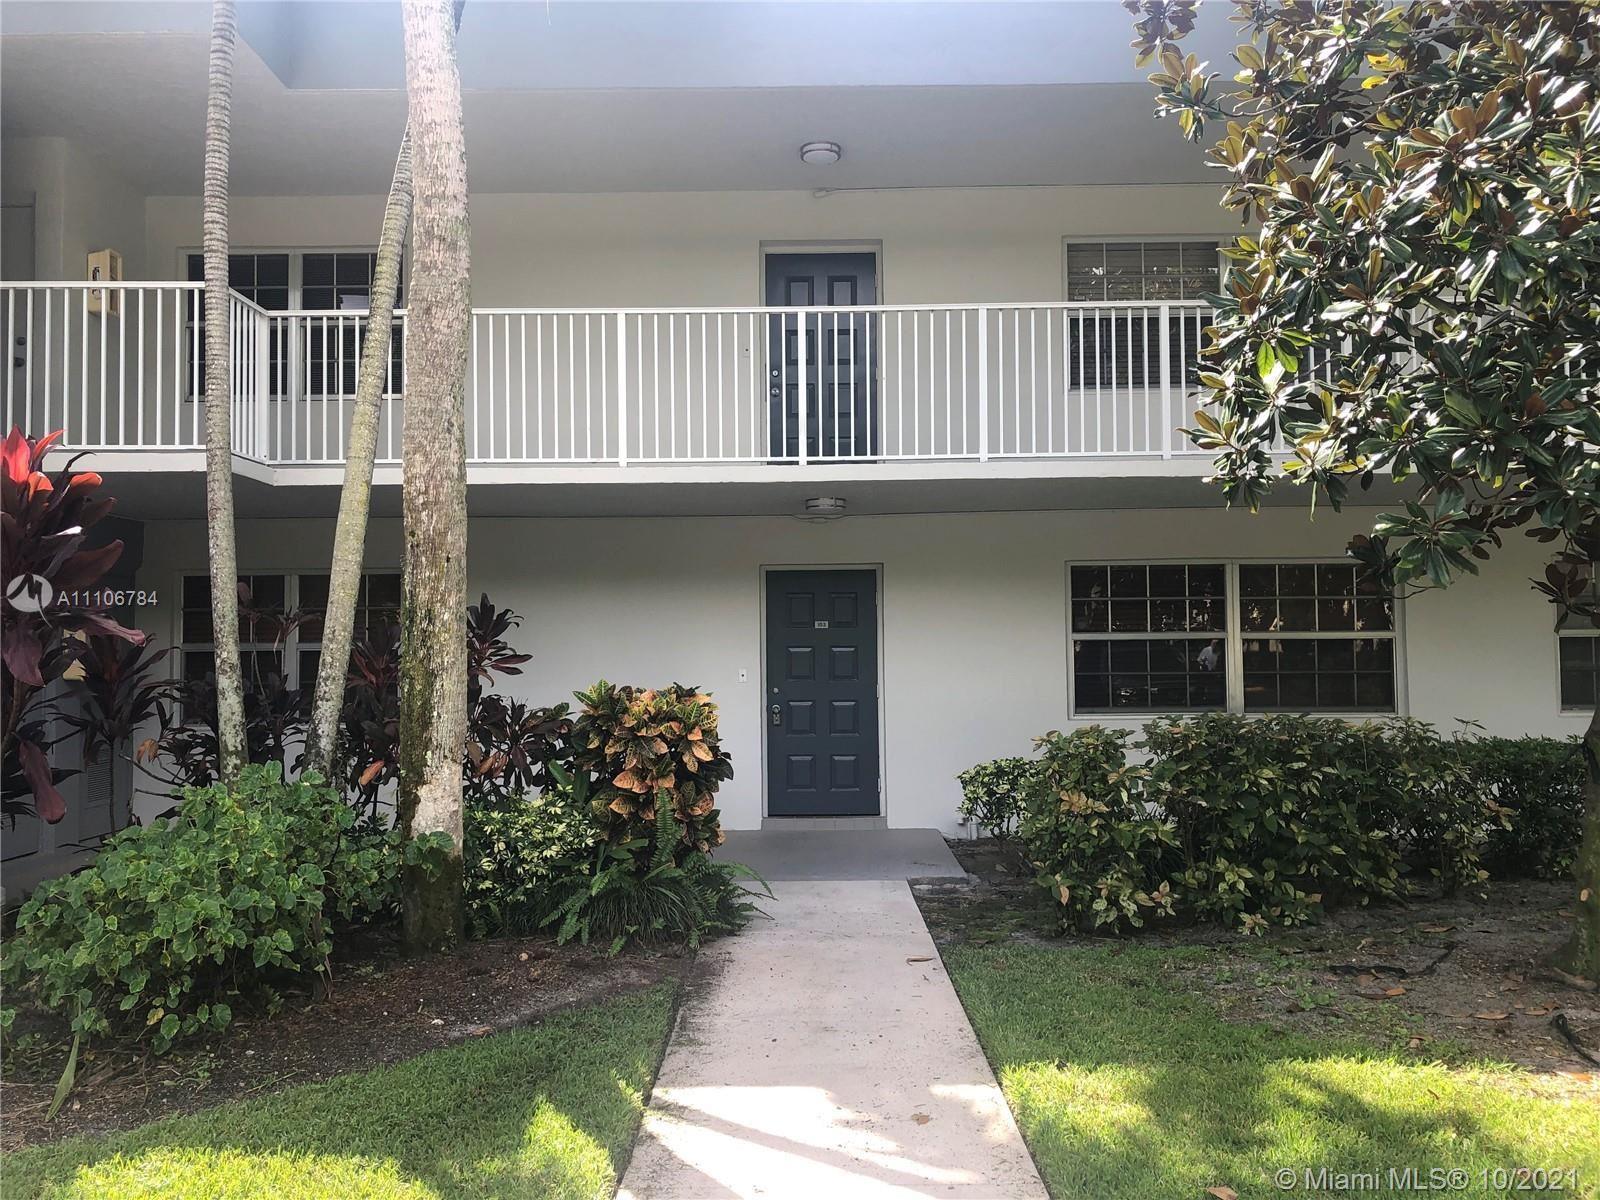 4280 Oaks Ter #103, Pompano Beach, FL 33069 - #: A11106784